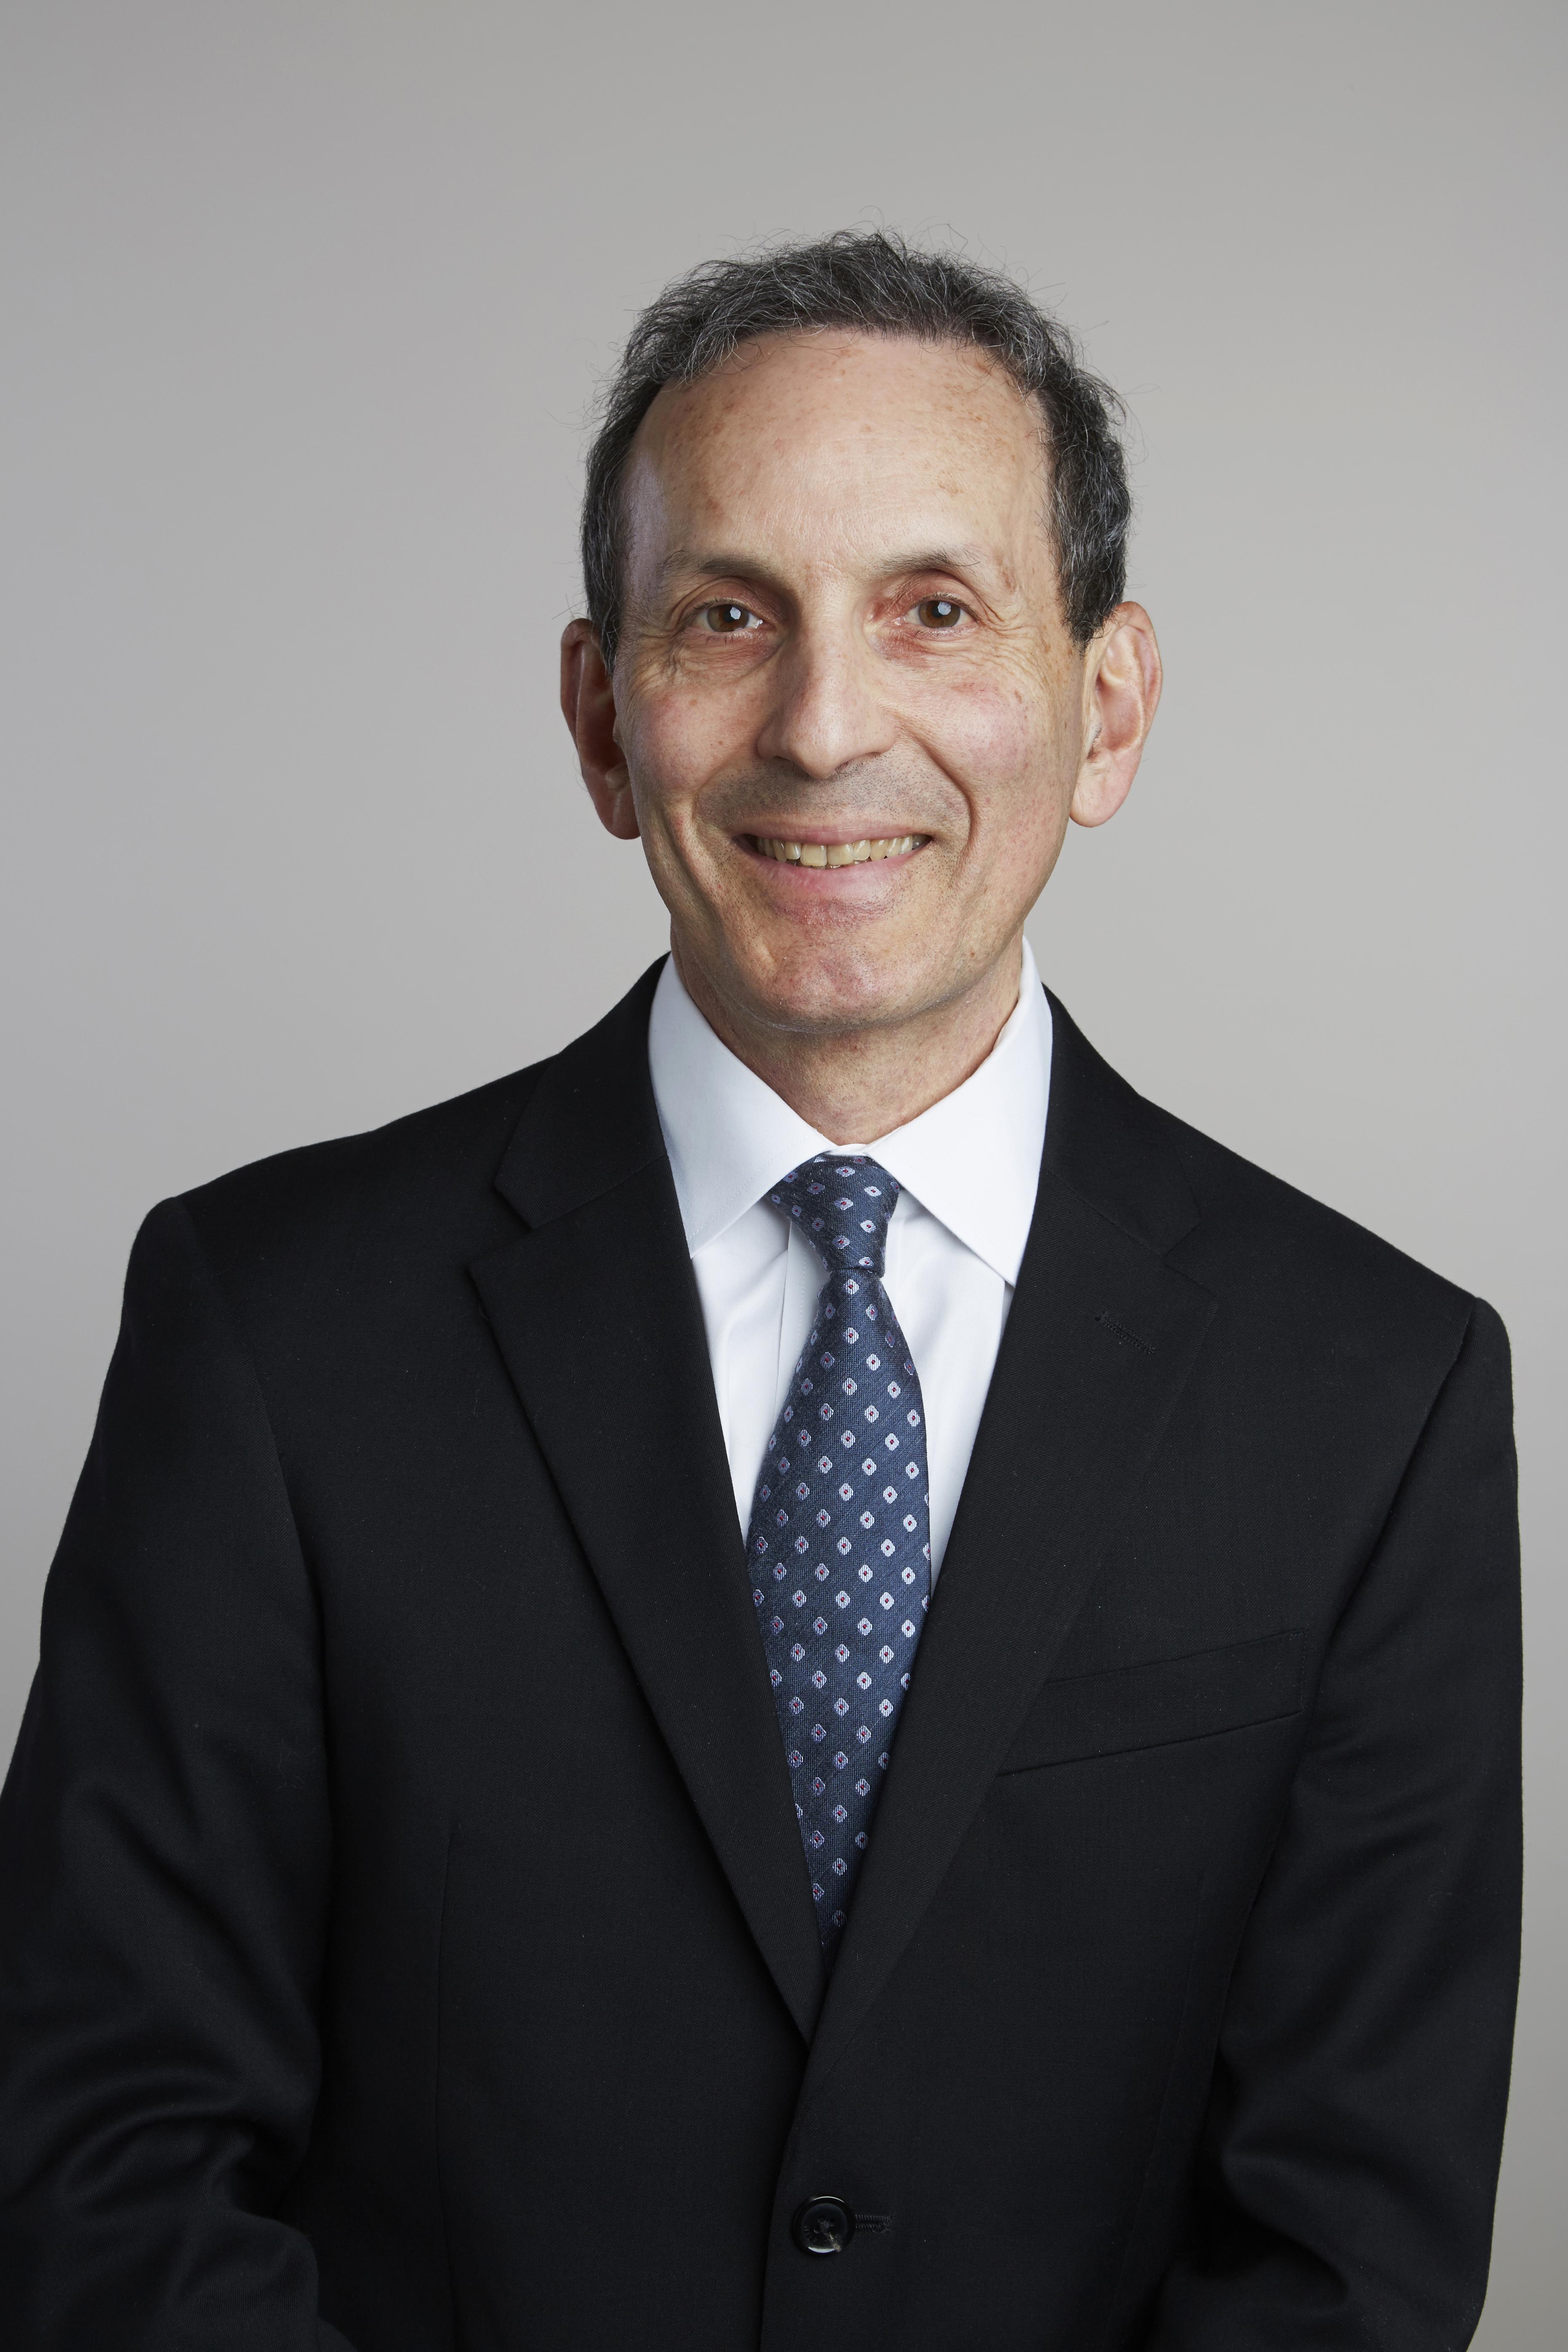 Dr. Daniel J. Drucker, Lunenfeld-Tanenbaum Research Institute